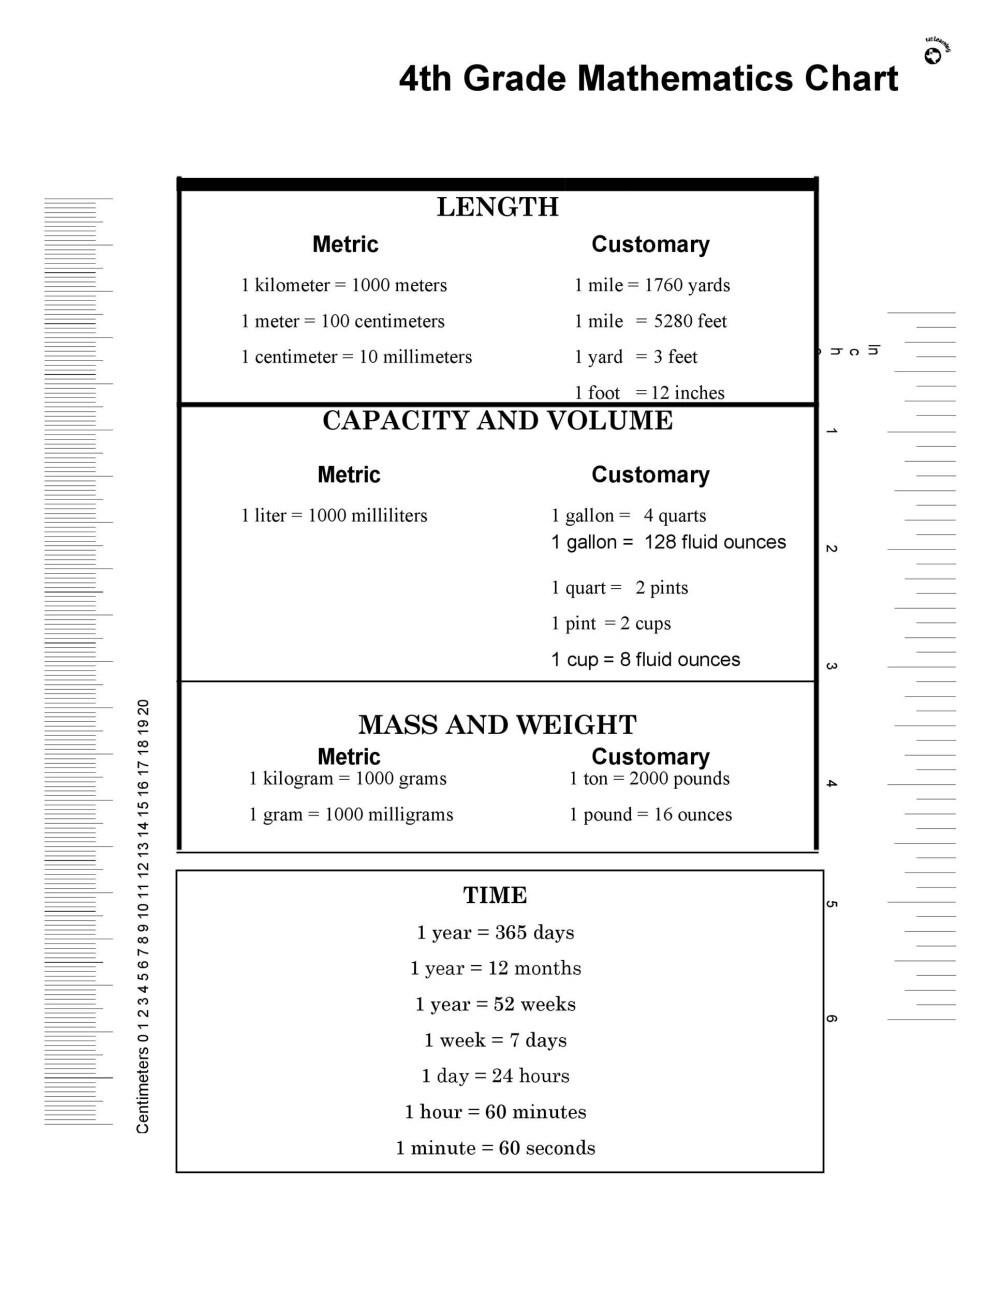 medium resolution of liquid capacity chart - The future